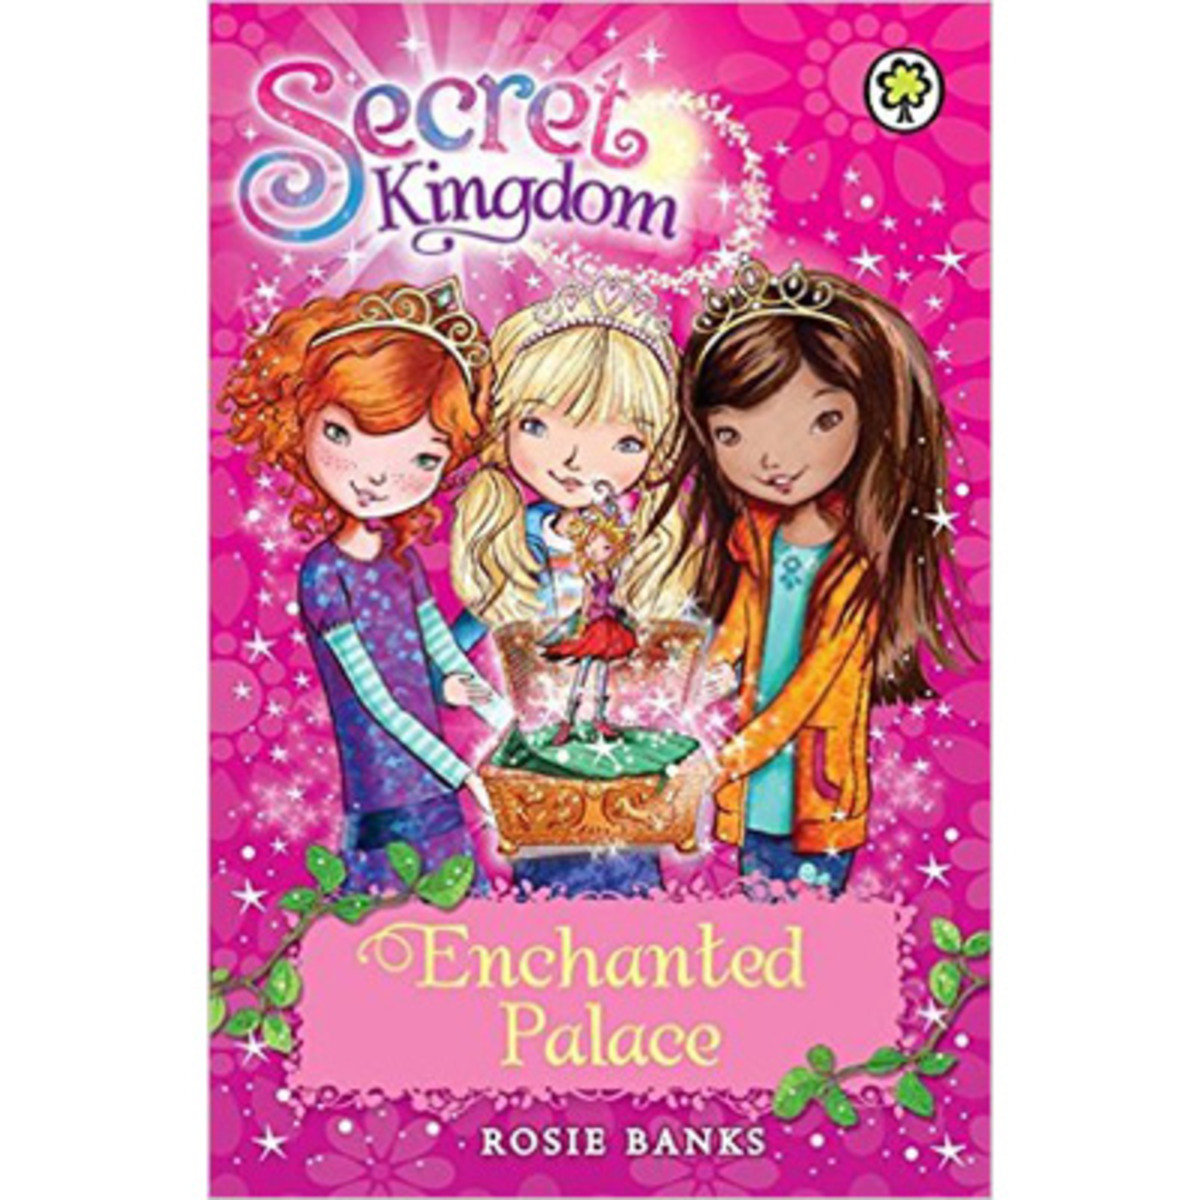 SECRET KINGDOM #1 ENCHANTED PLACE 9781408323649